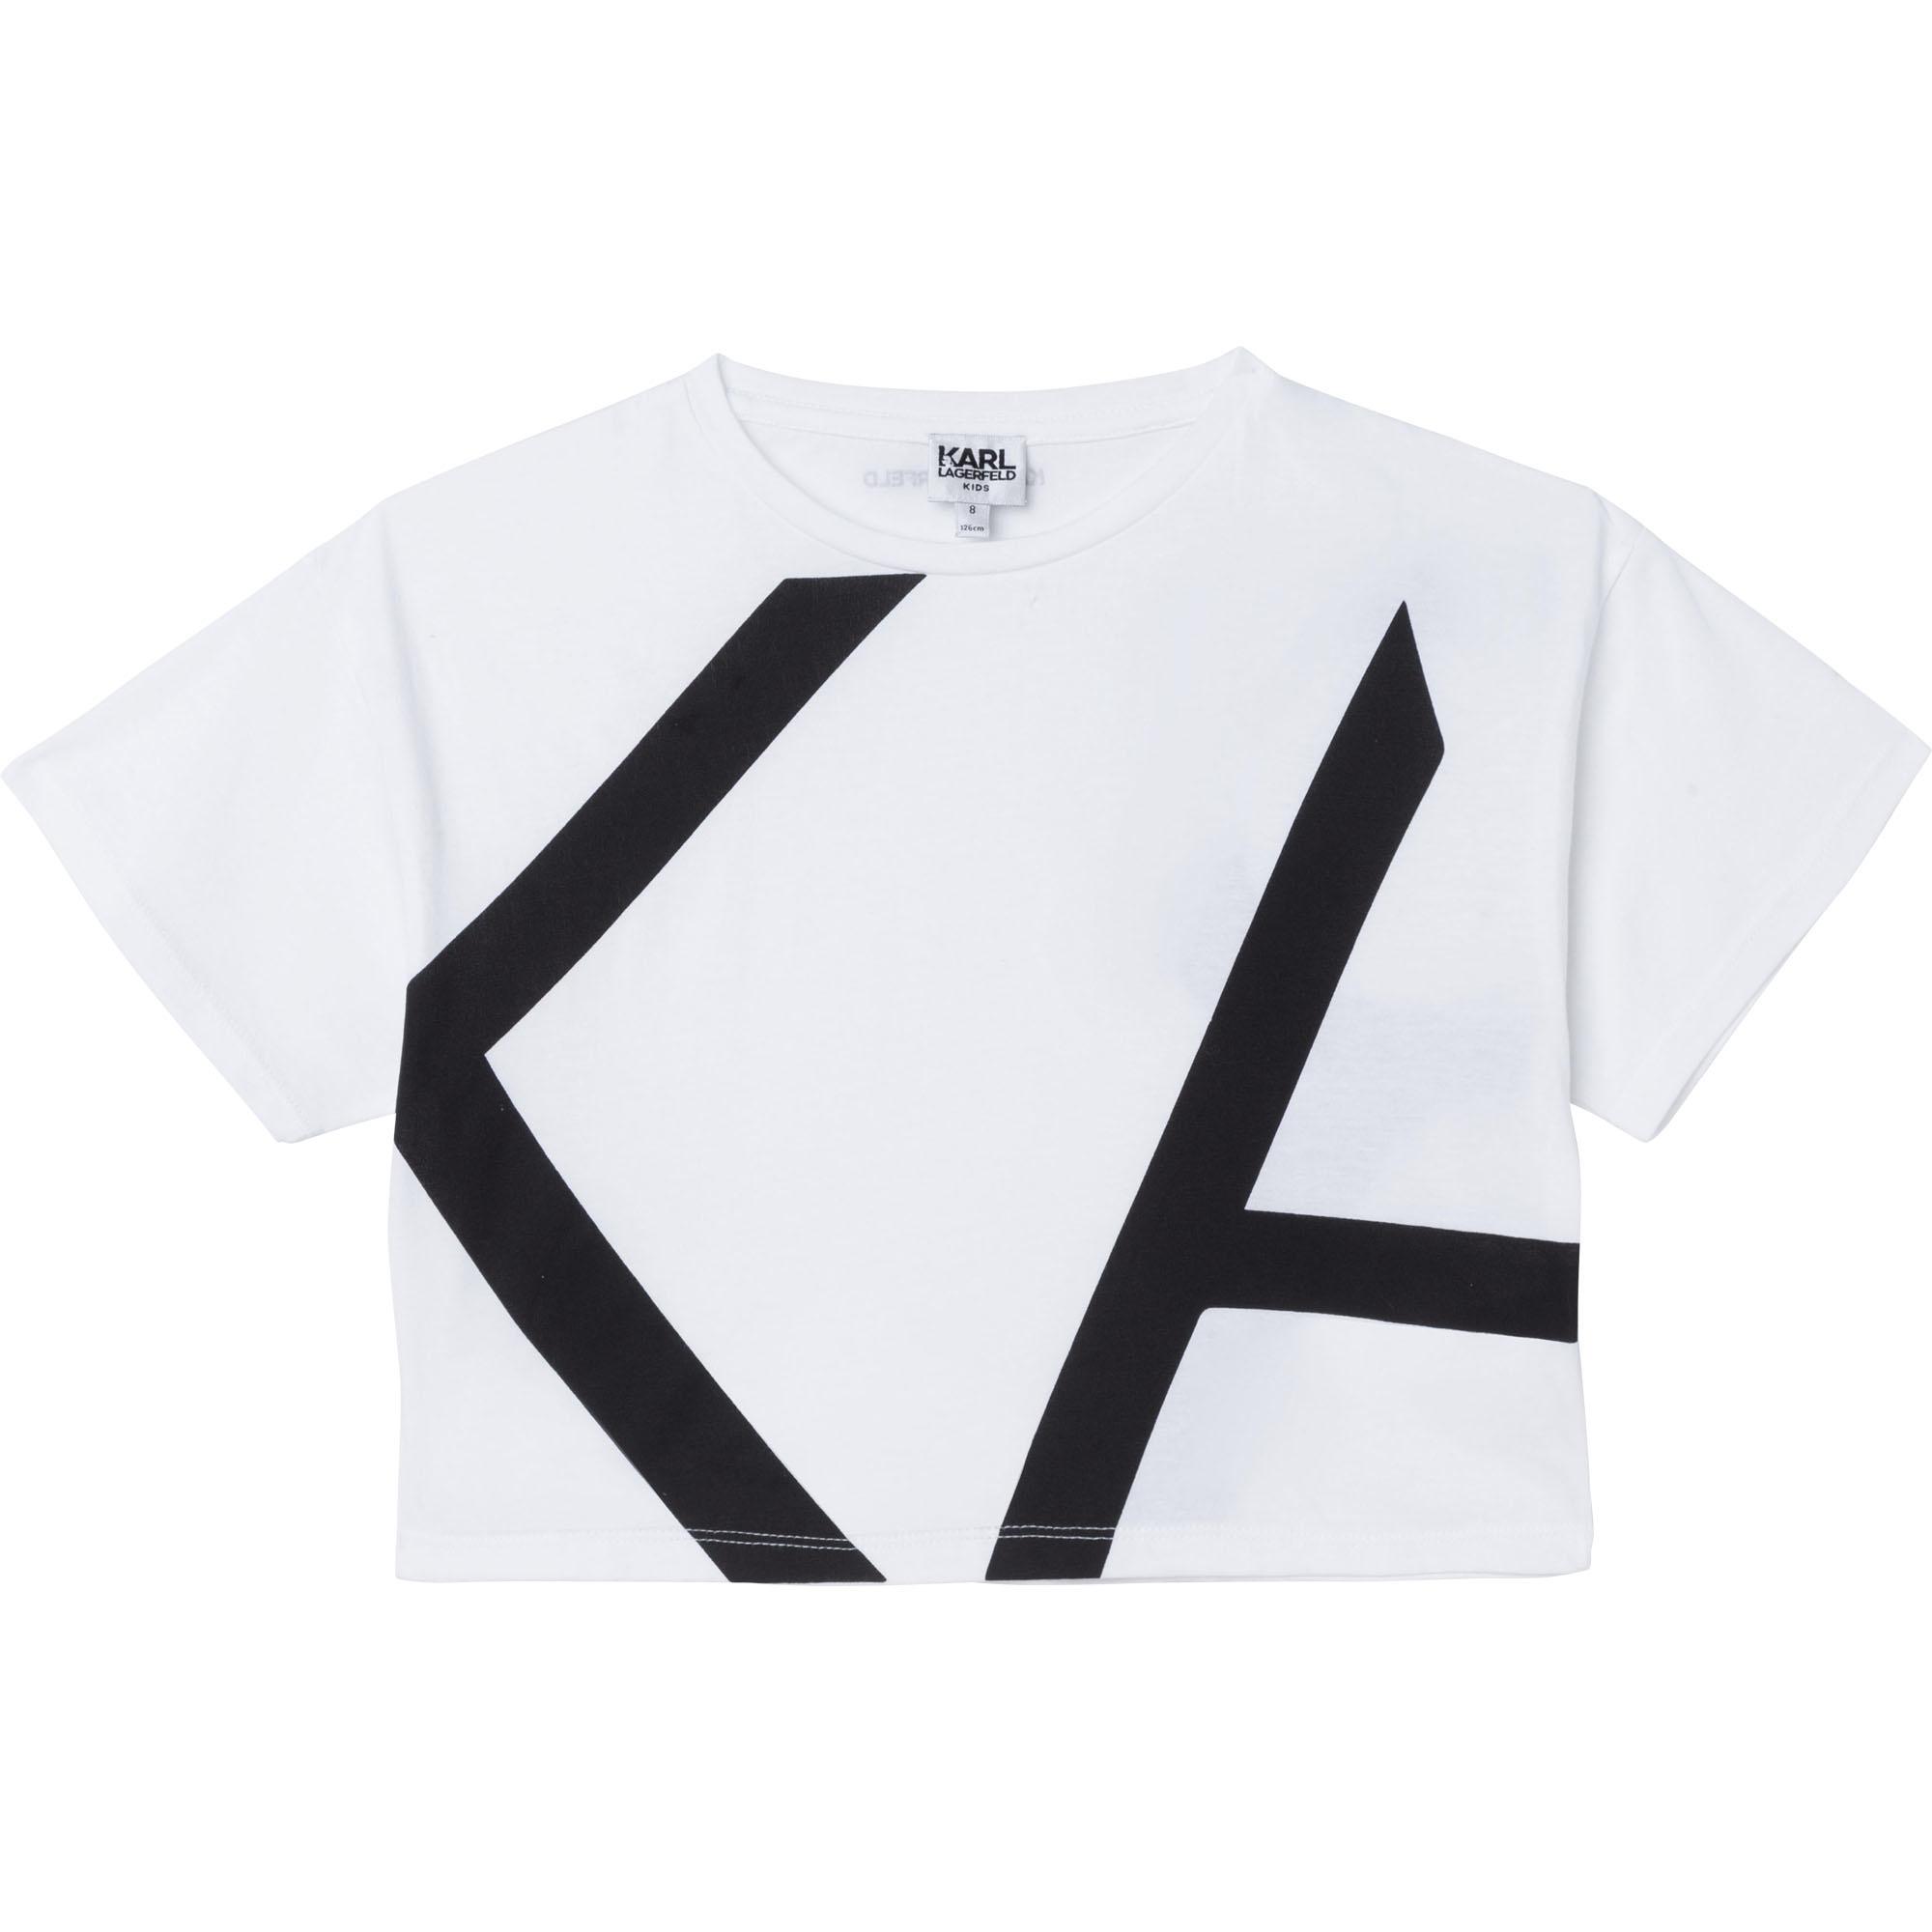 KARL LAGERFELD  KIDS  t-shirt modal-1